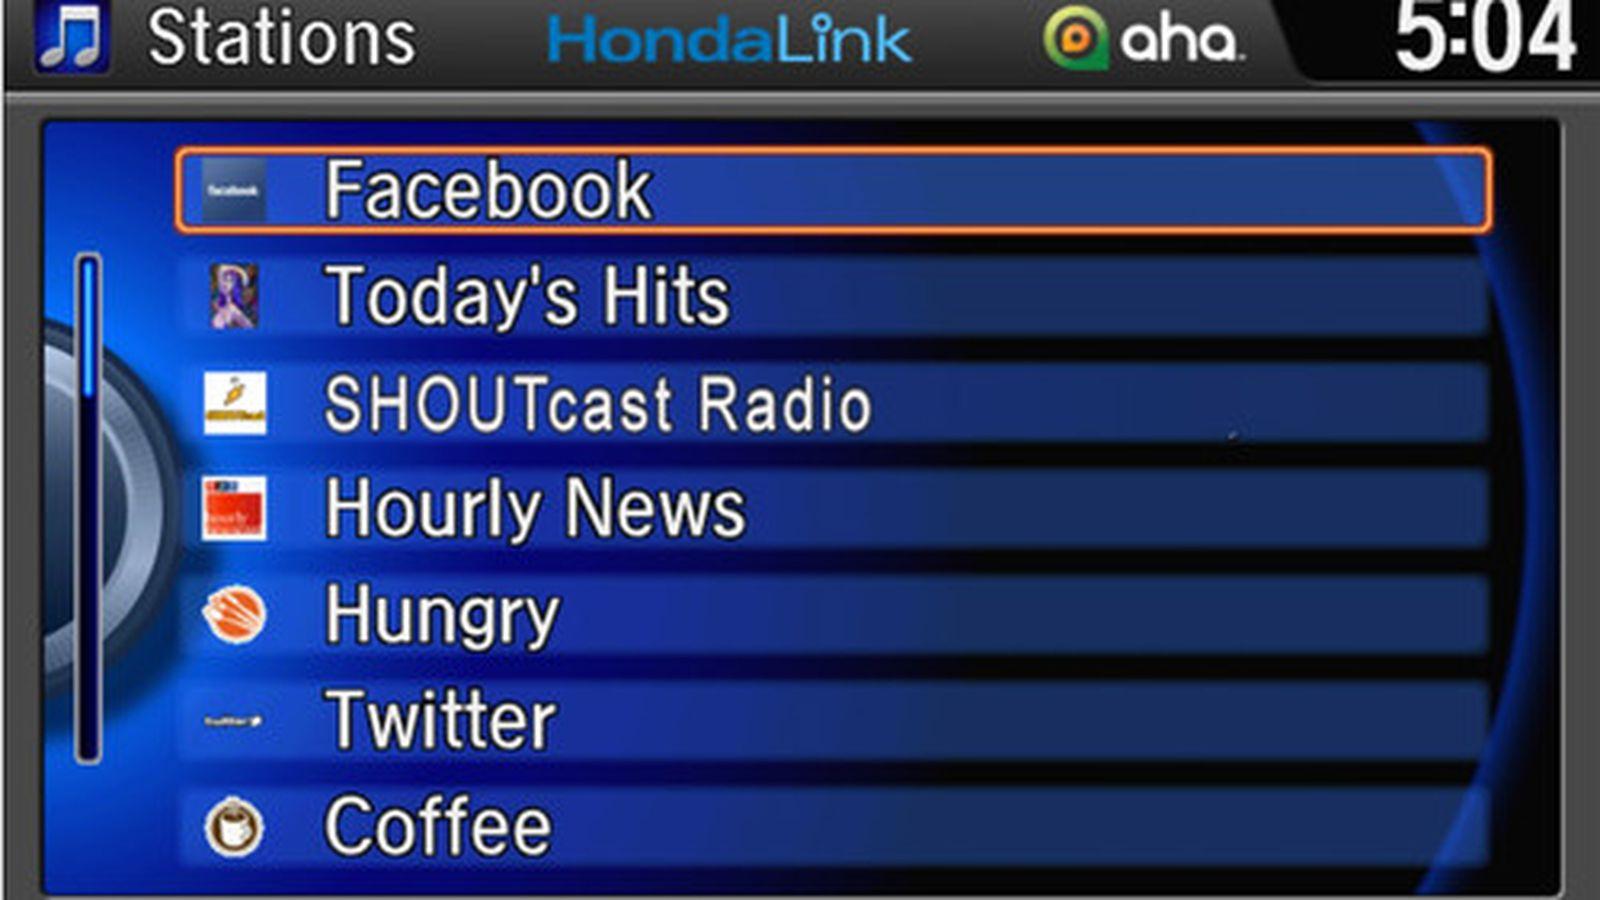 HondaLink brings Aha Radio powered audio content to Honda vehicles 1600x900